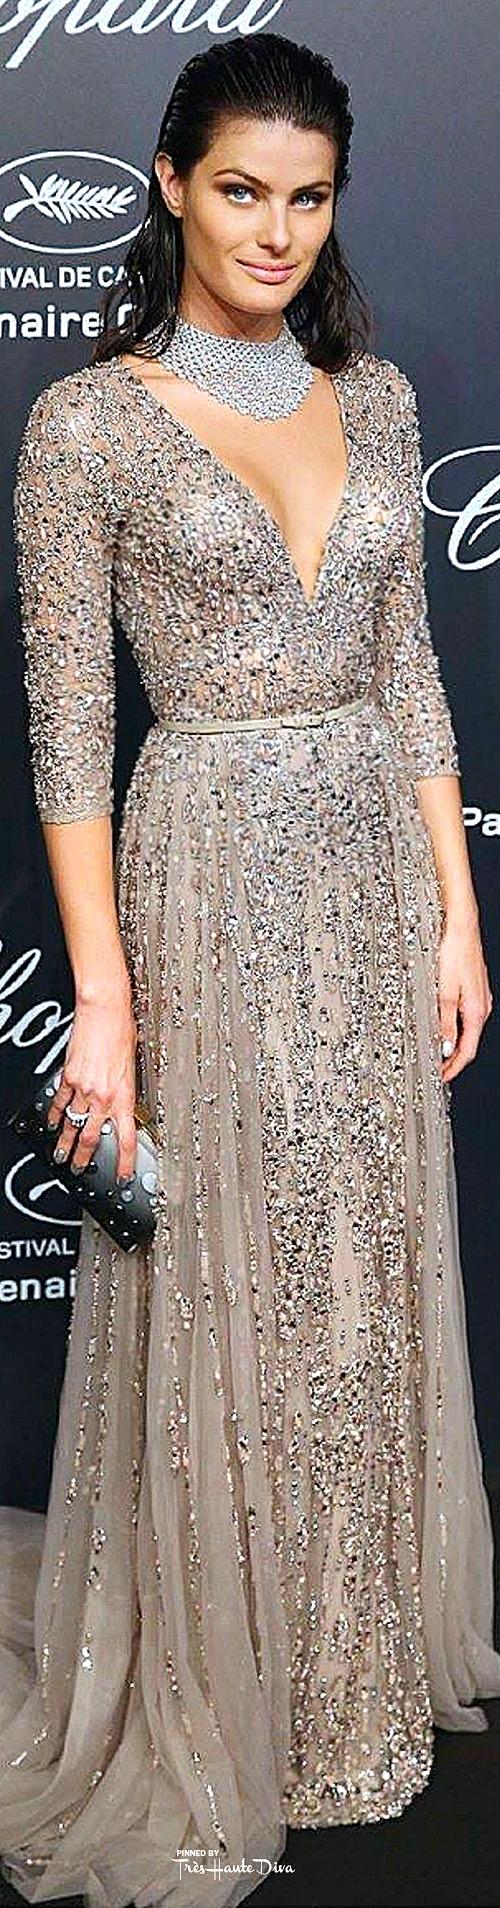 Isabeli Fontana                     elle.uk.com